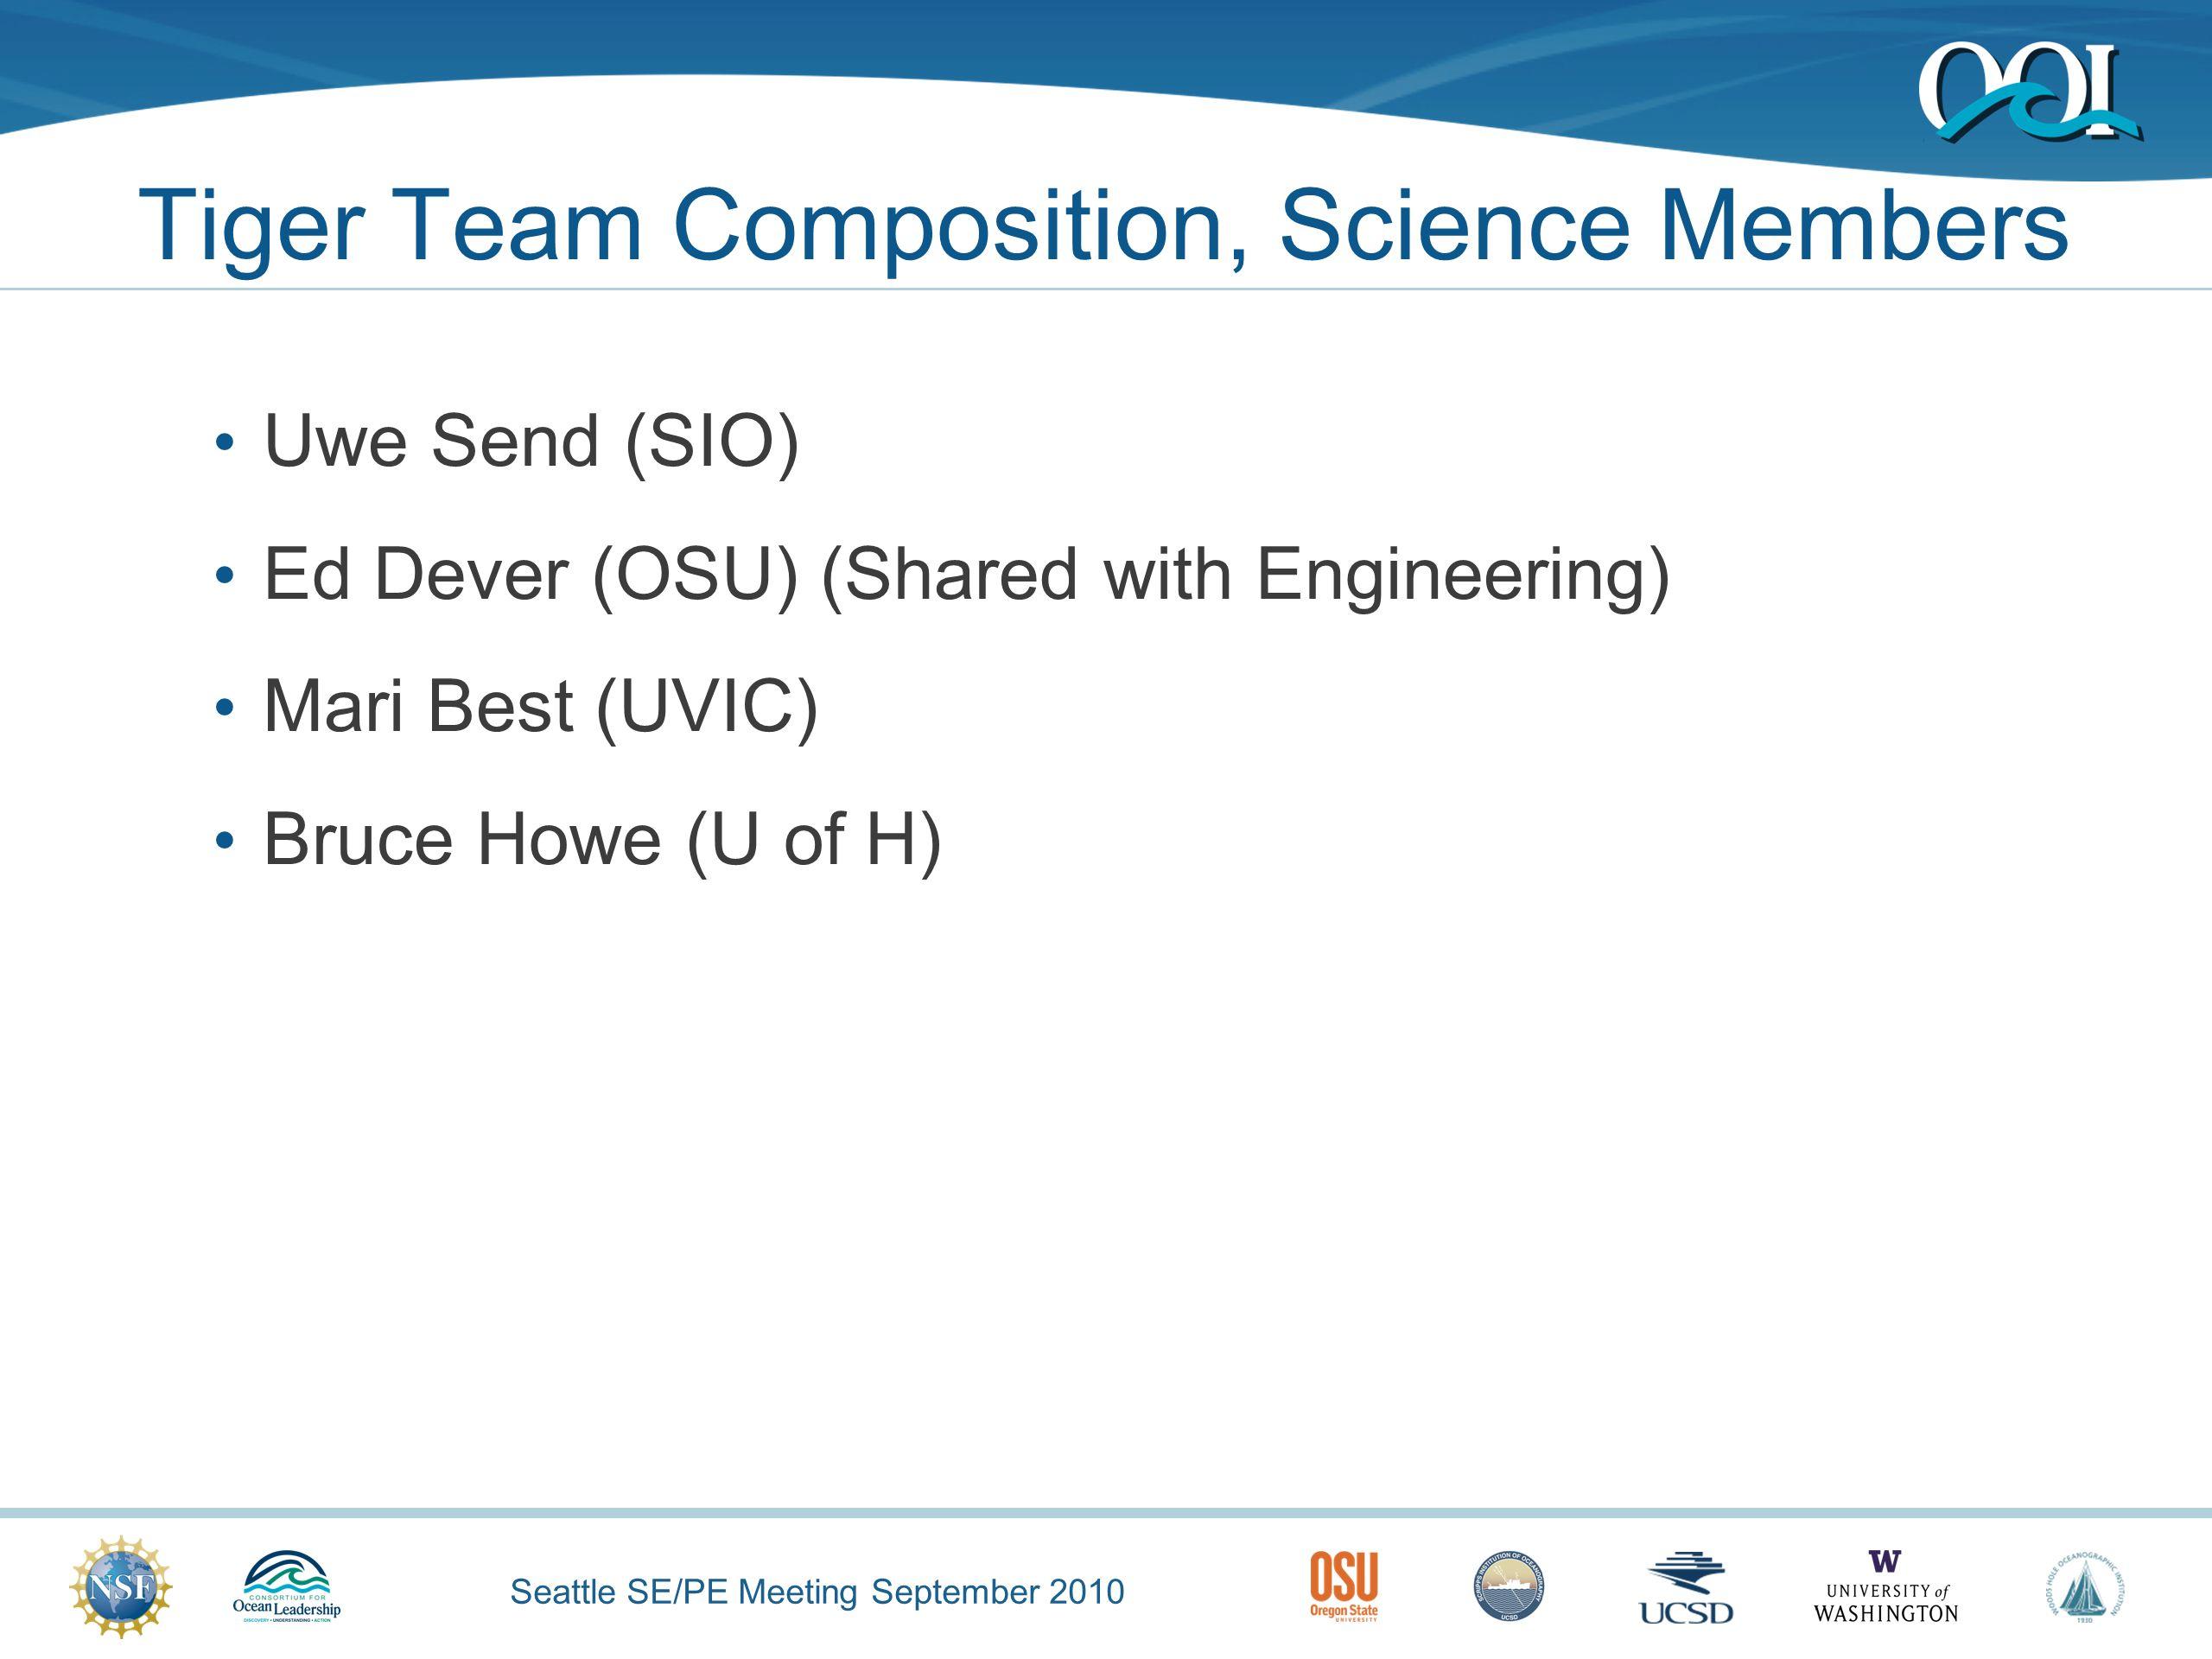 Seattle SE/PE Meeting September 2010 Tiger Team Composition, Science Members Uwe Send (SIO) Ed Dever (OSU) (Shared with Engineering) Mari Best (UVIC) Bruce Howe (U of H)